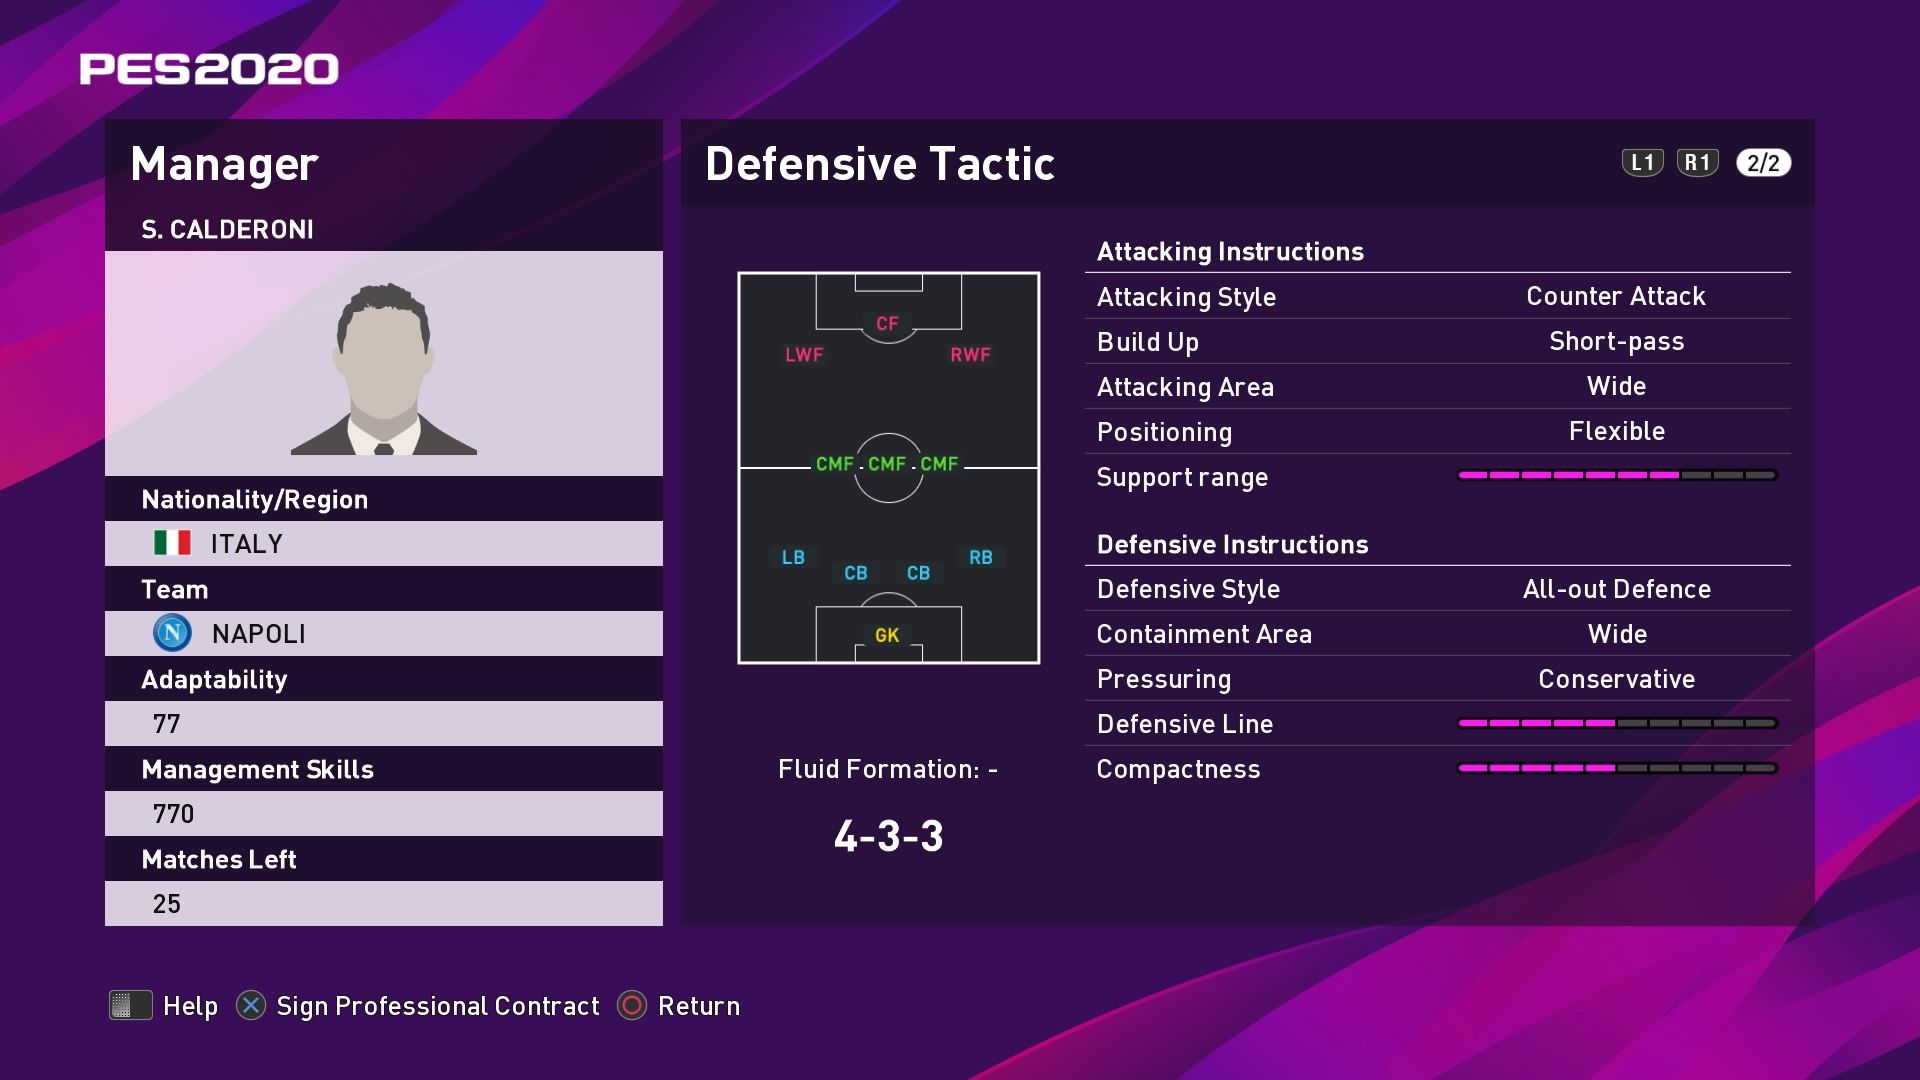 S. Calderoni (Gennaro Gattuso) Defensive Tactic in PES 2020 myClub